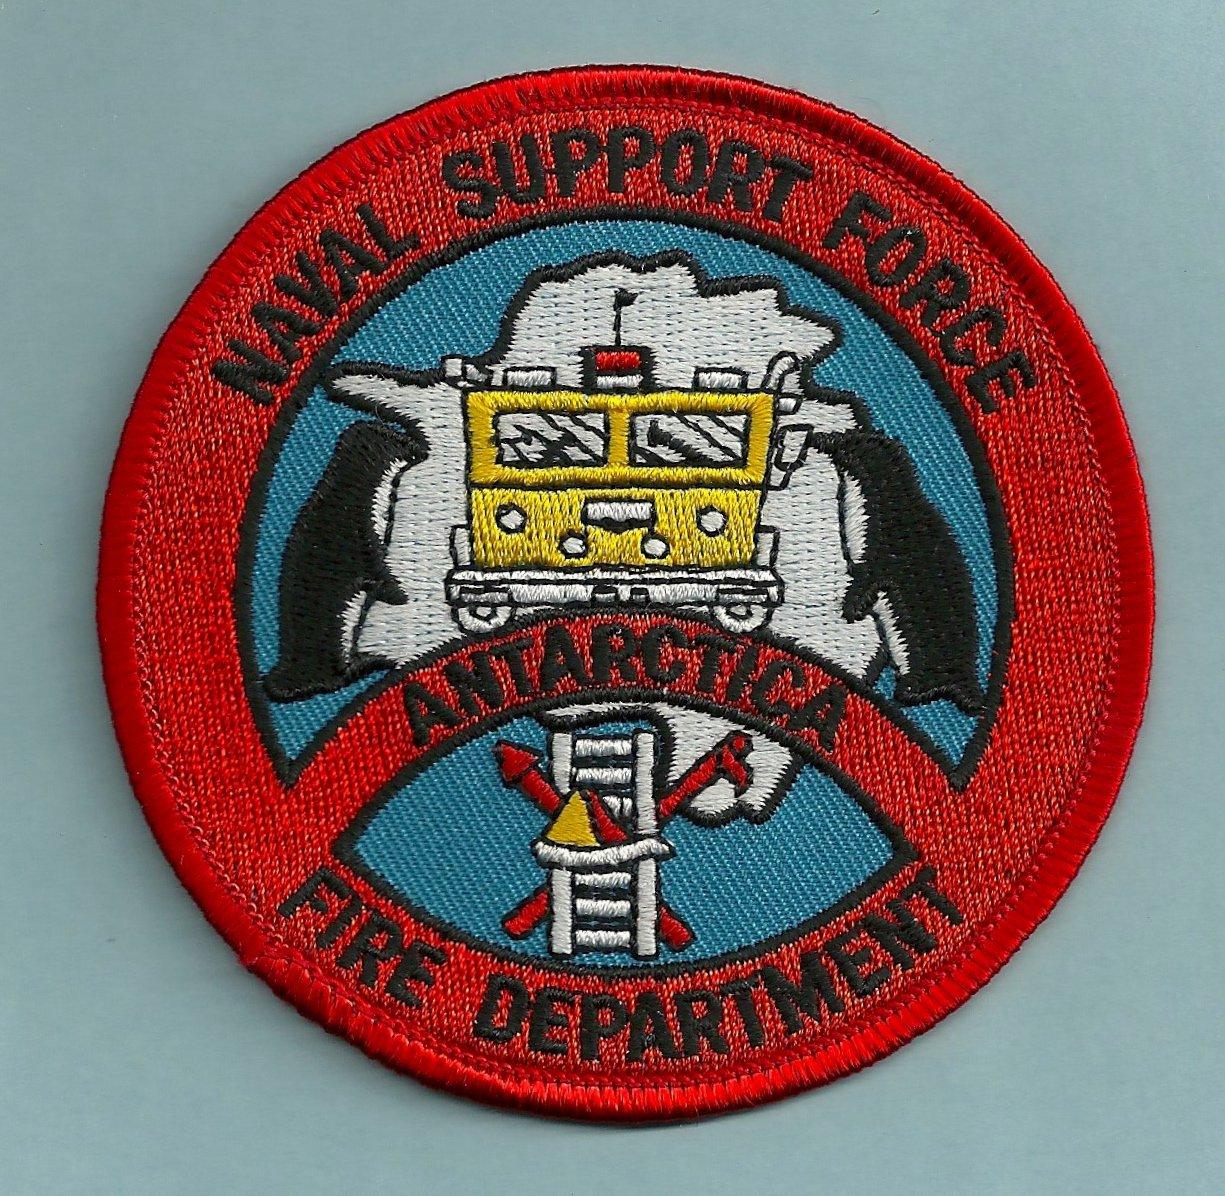 McMurdo Antarctica U.S. Naval Support Force Fire Rescue Patch